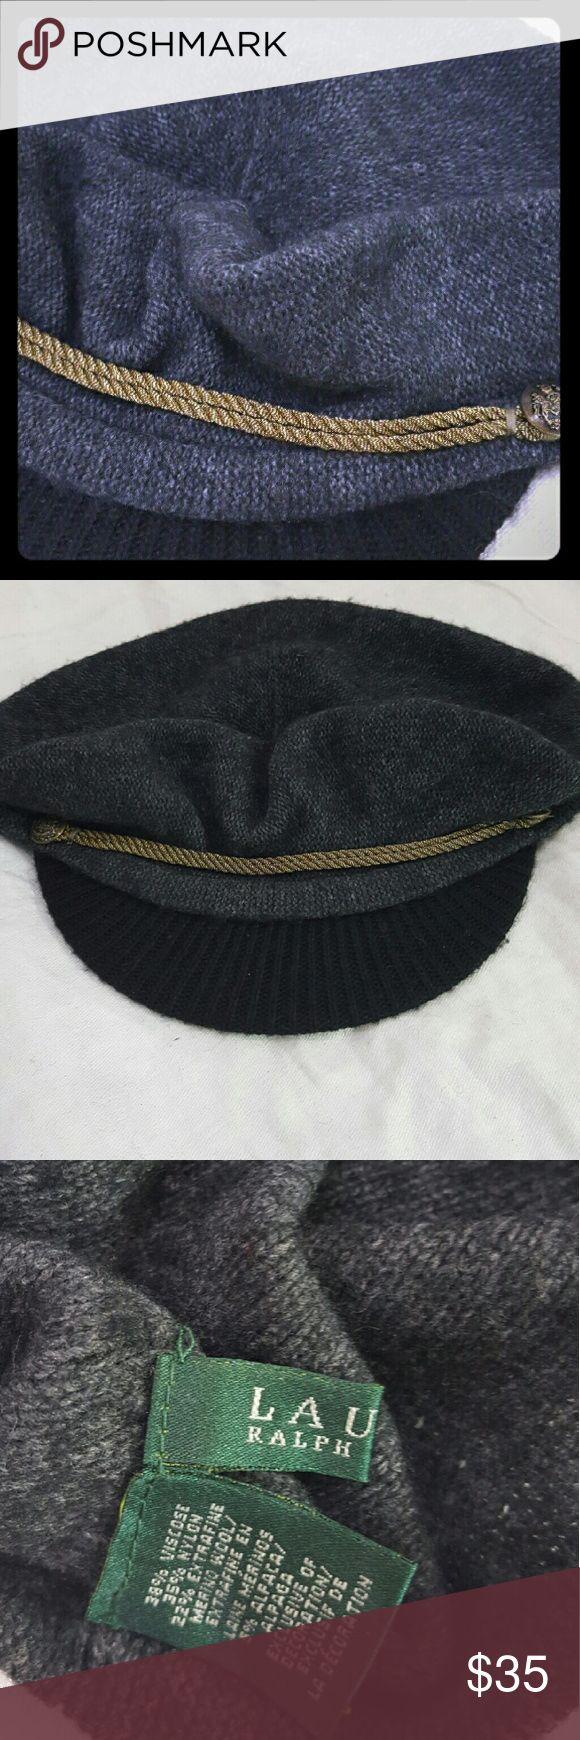 Ralph Lauren Greek Fishermans Cap Great for the fall season . Good Condition Ralph Lauren Accessories Hats